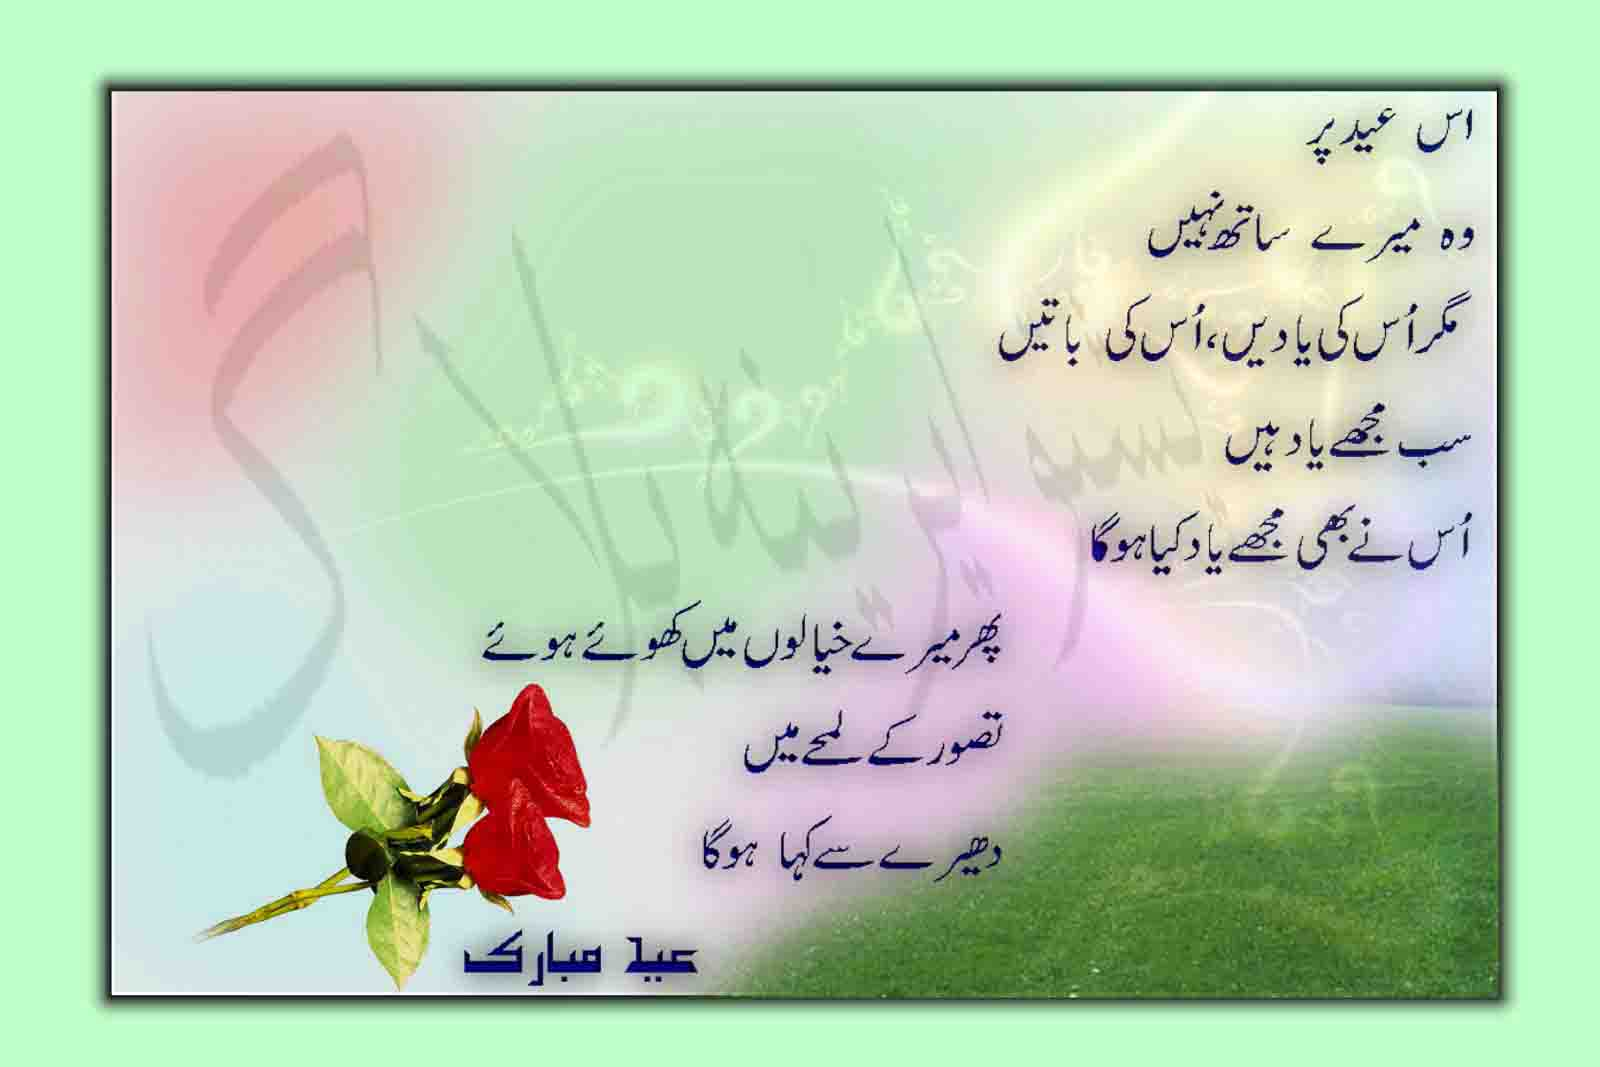 http://2.bp.blogspot.com/-PXfwhbxooPM/Tq1DKf0bvaI/AAAAAAAAB5A/BVm_DC269aE/s1600/Eid+Chand+Urdu+poetry+%25281%2529.jpg